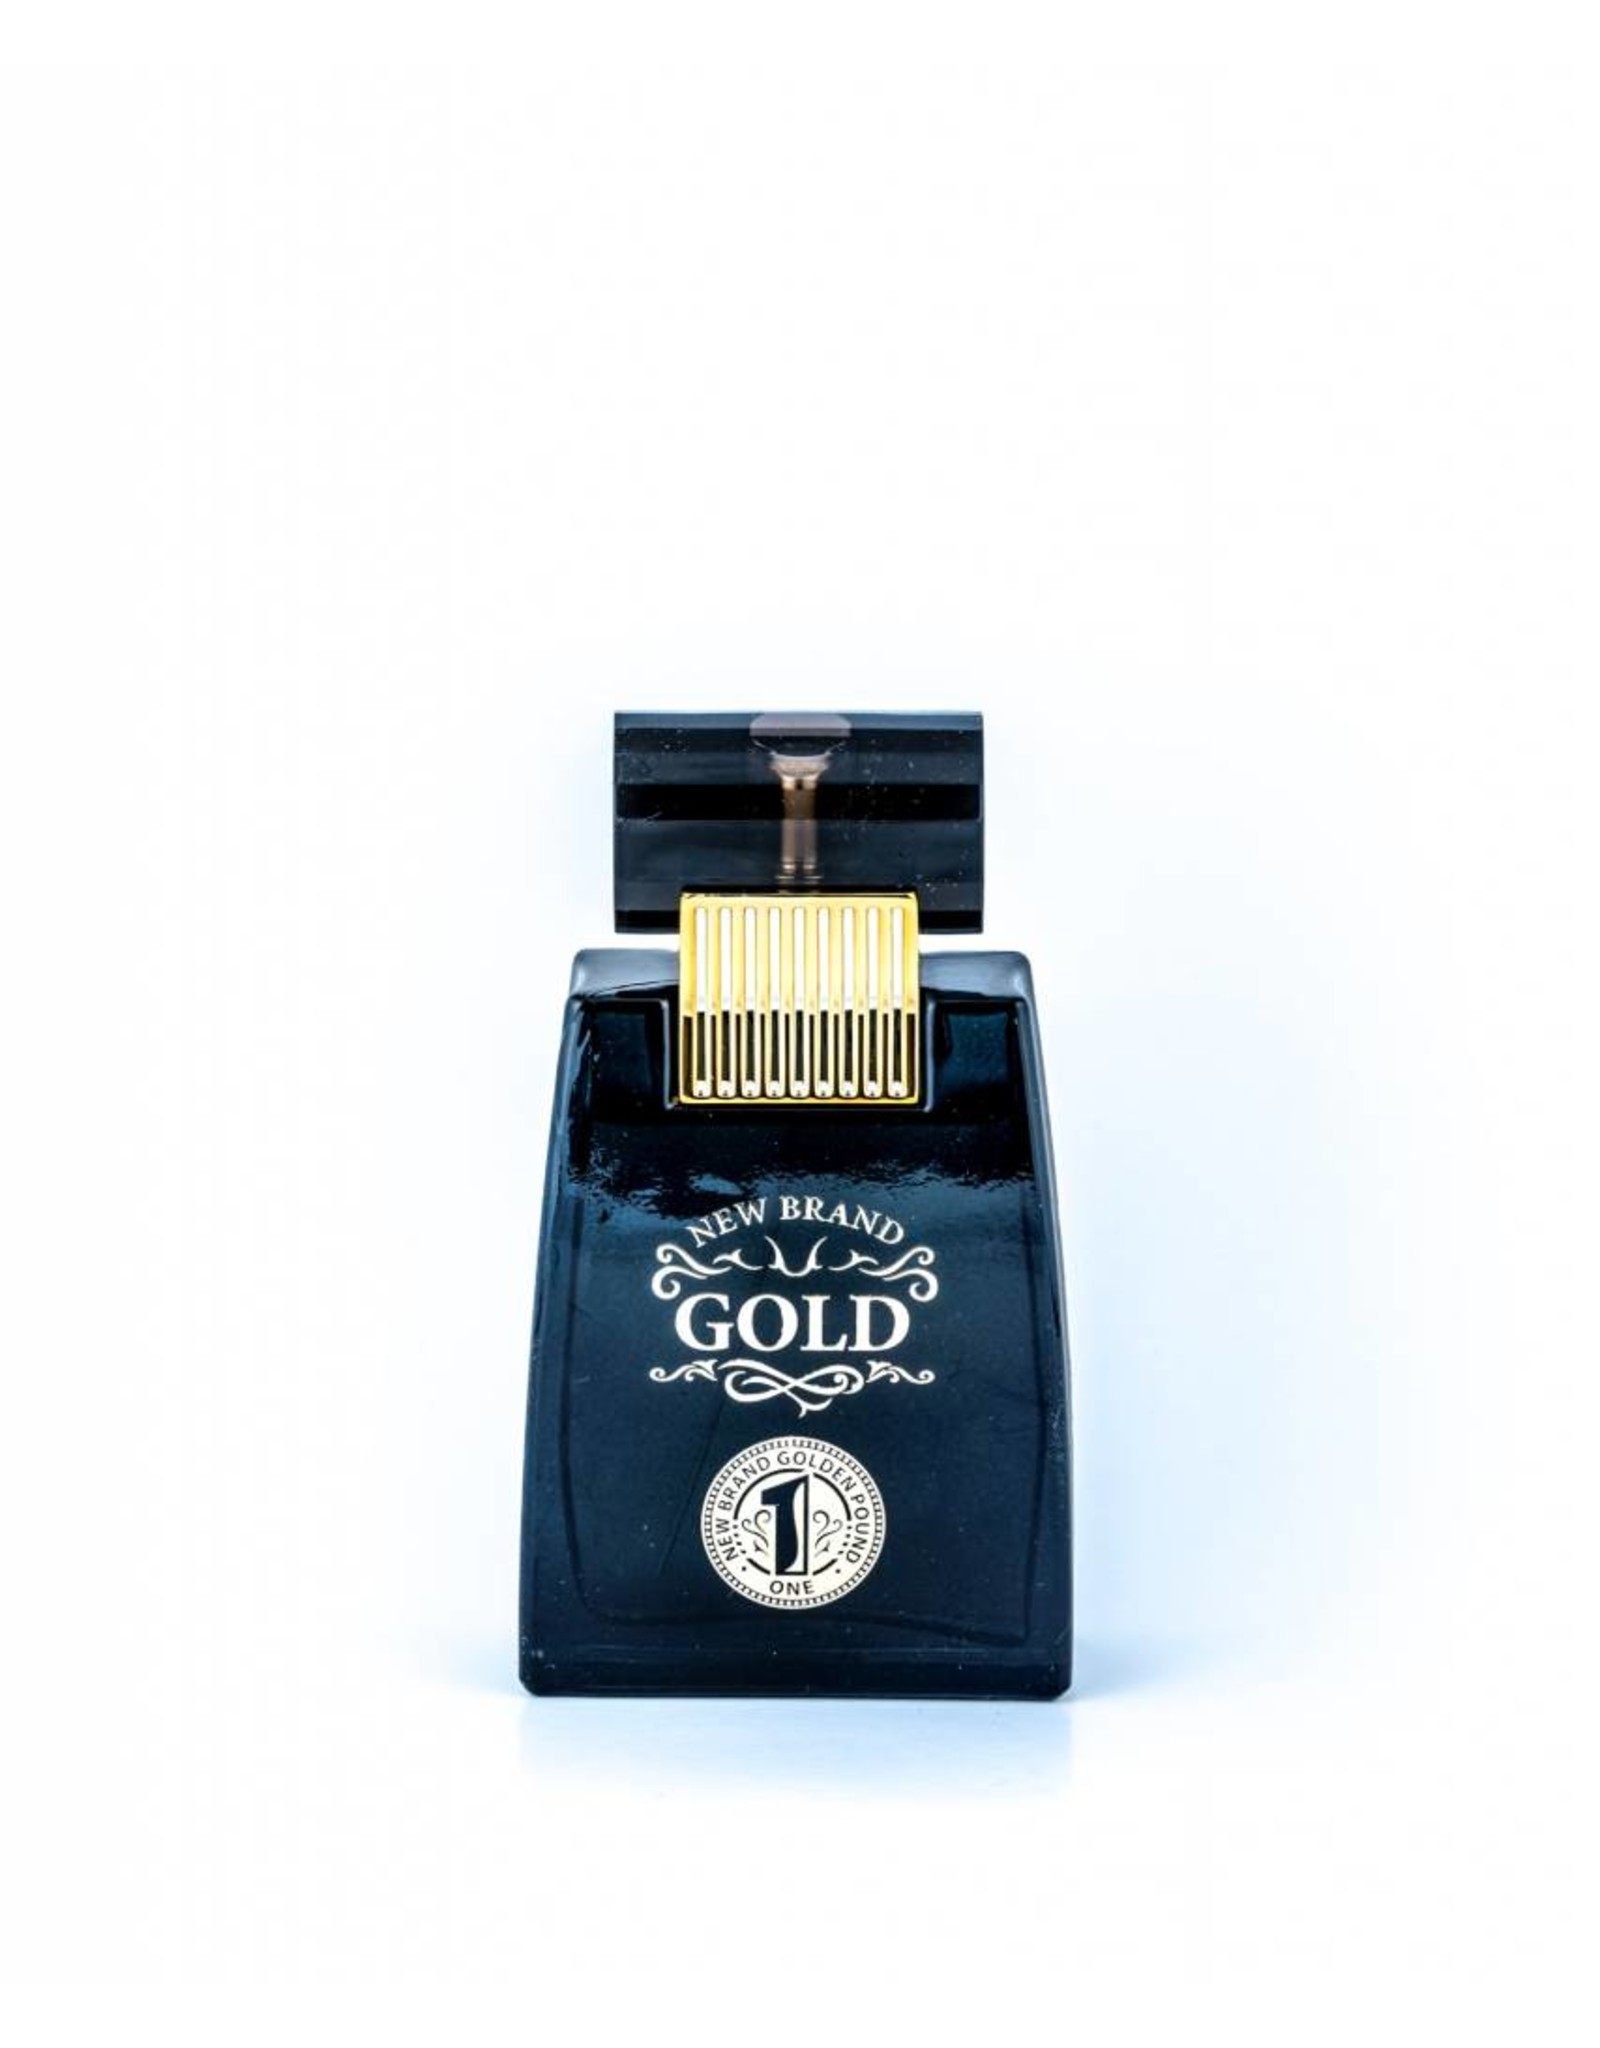 NEW BRAND GOLD